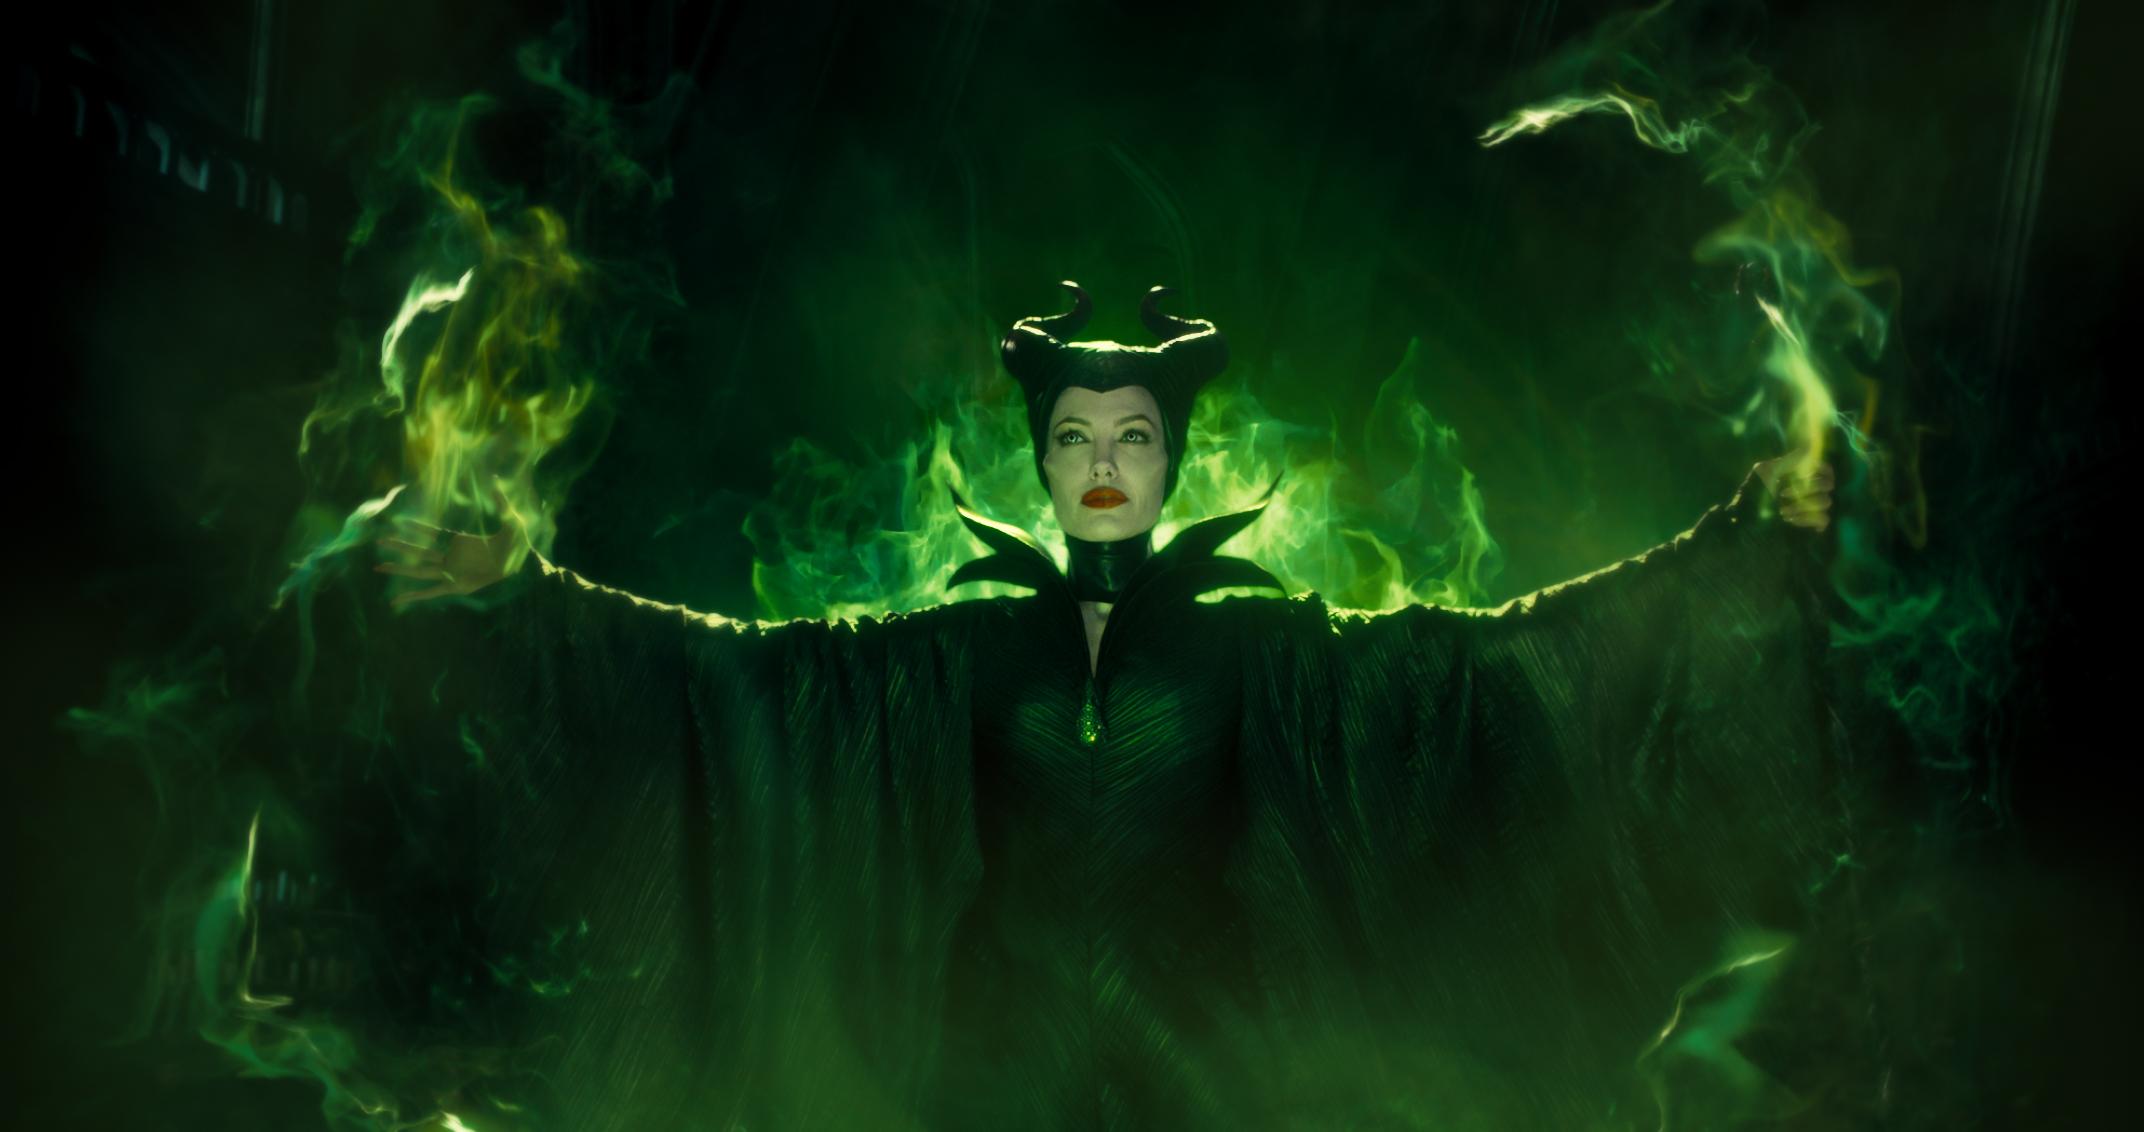 Disney's Maleficent starring Angelina Jolie